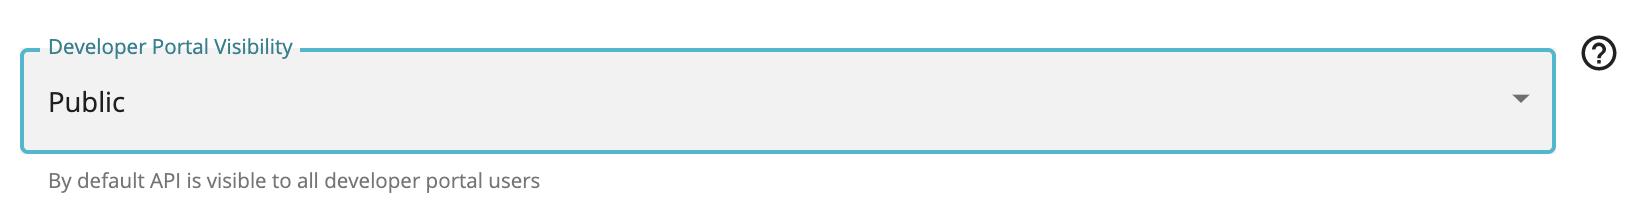 Developer Portal Visibility